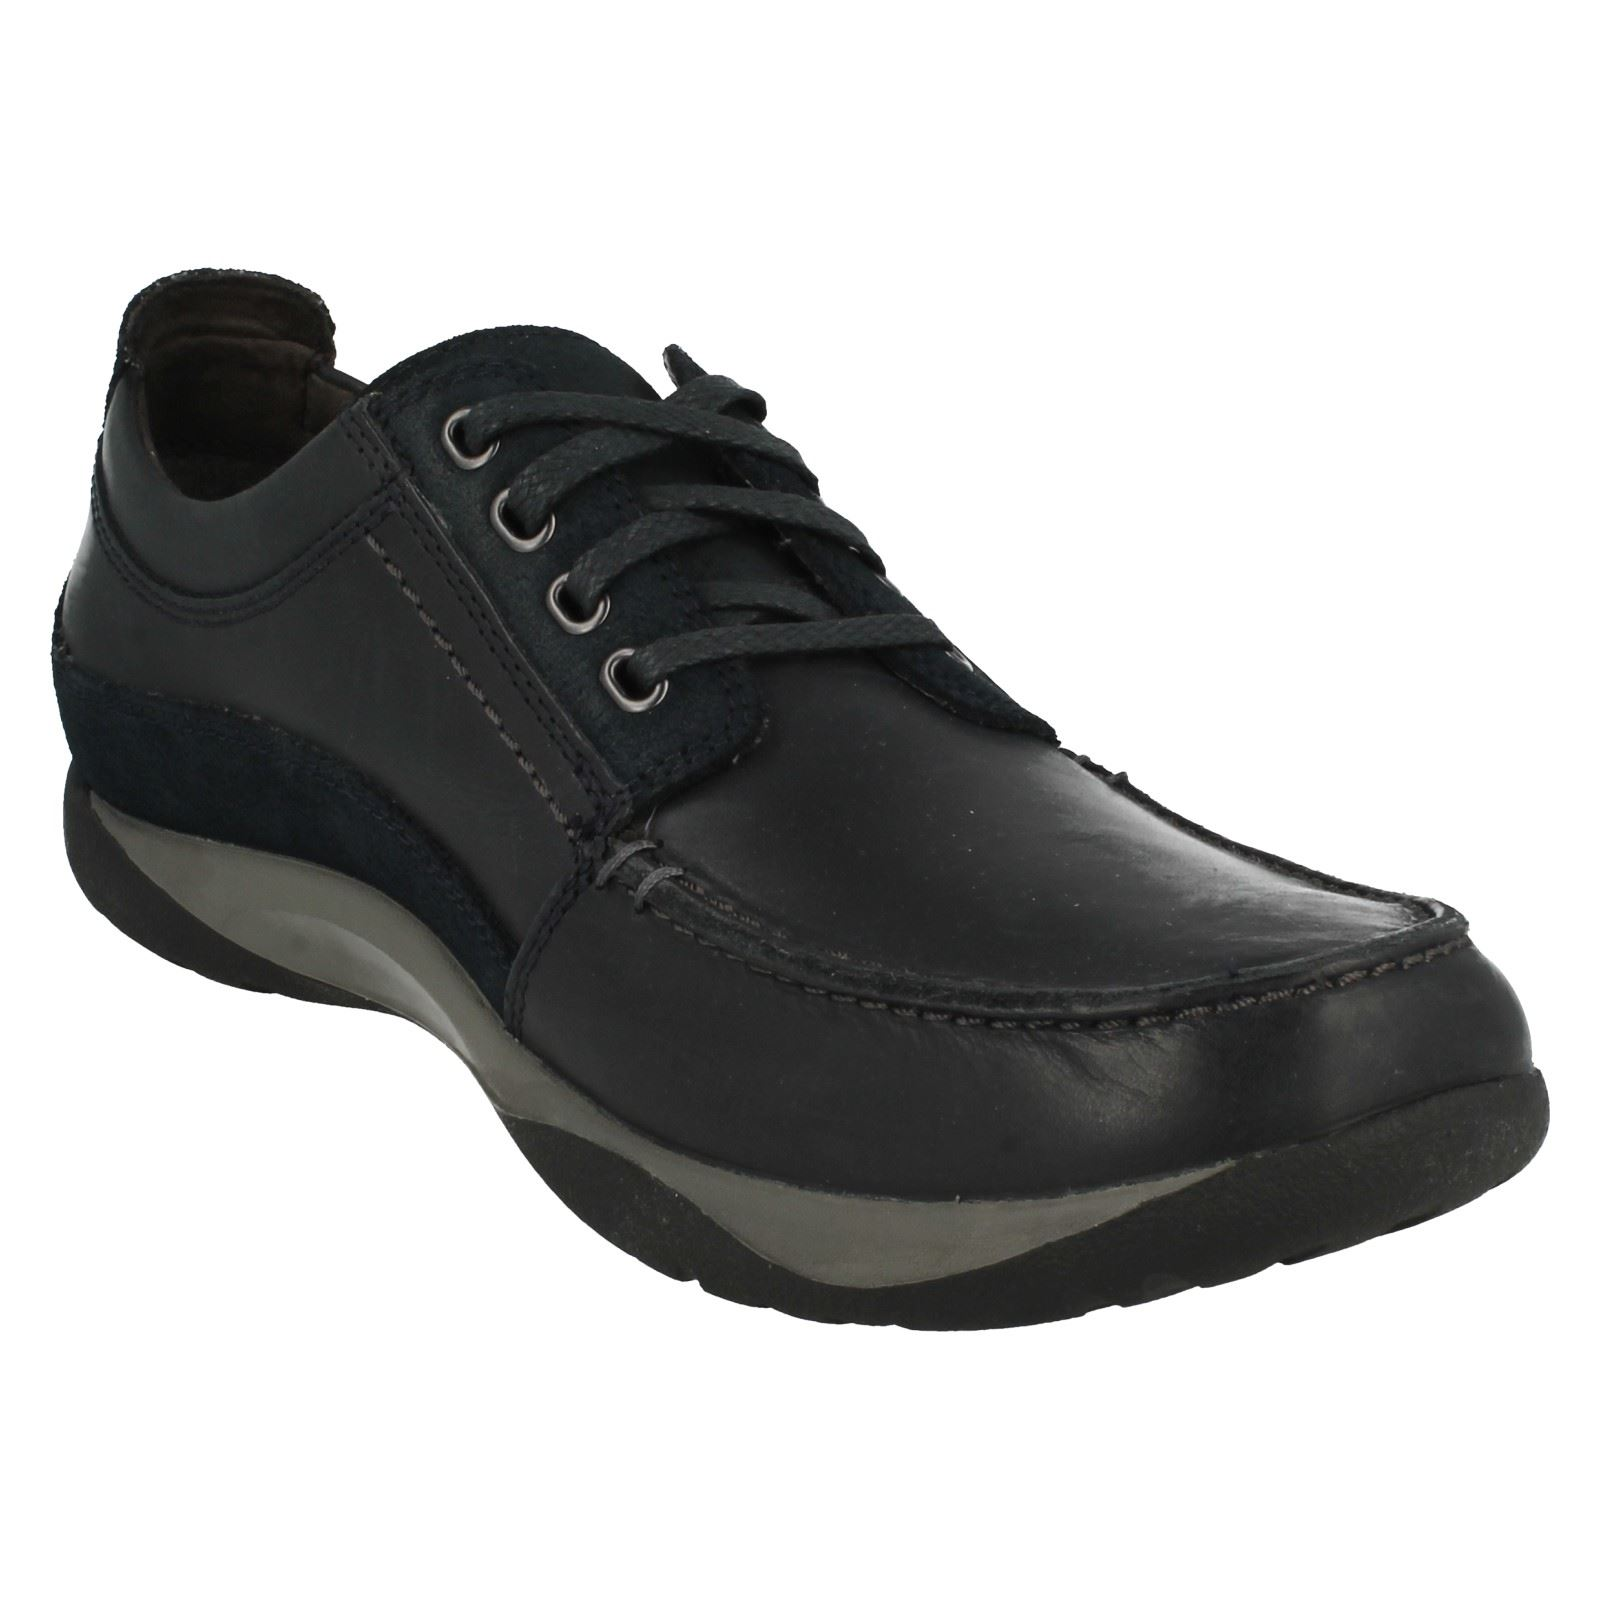 Con Diario Andar Cordones Informal Zapatos Clarks Route Hombre qp8wfIRFF